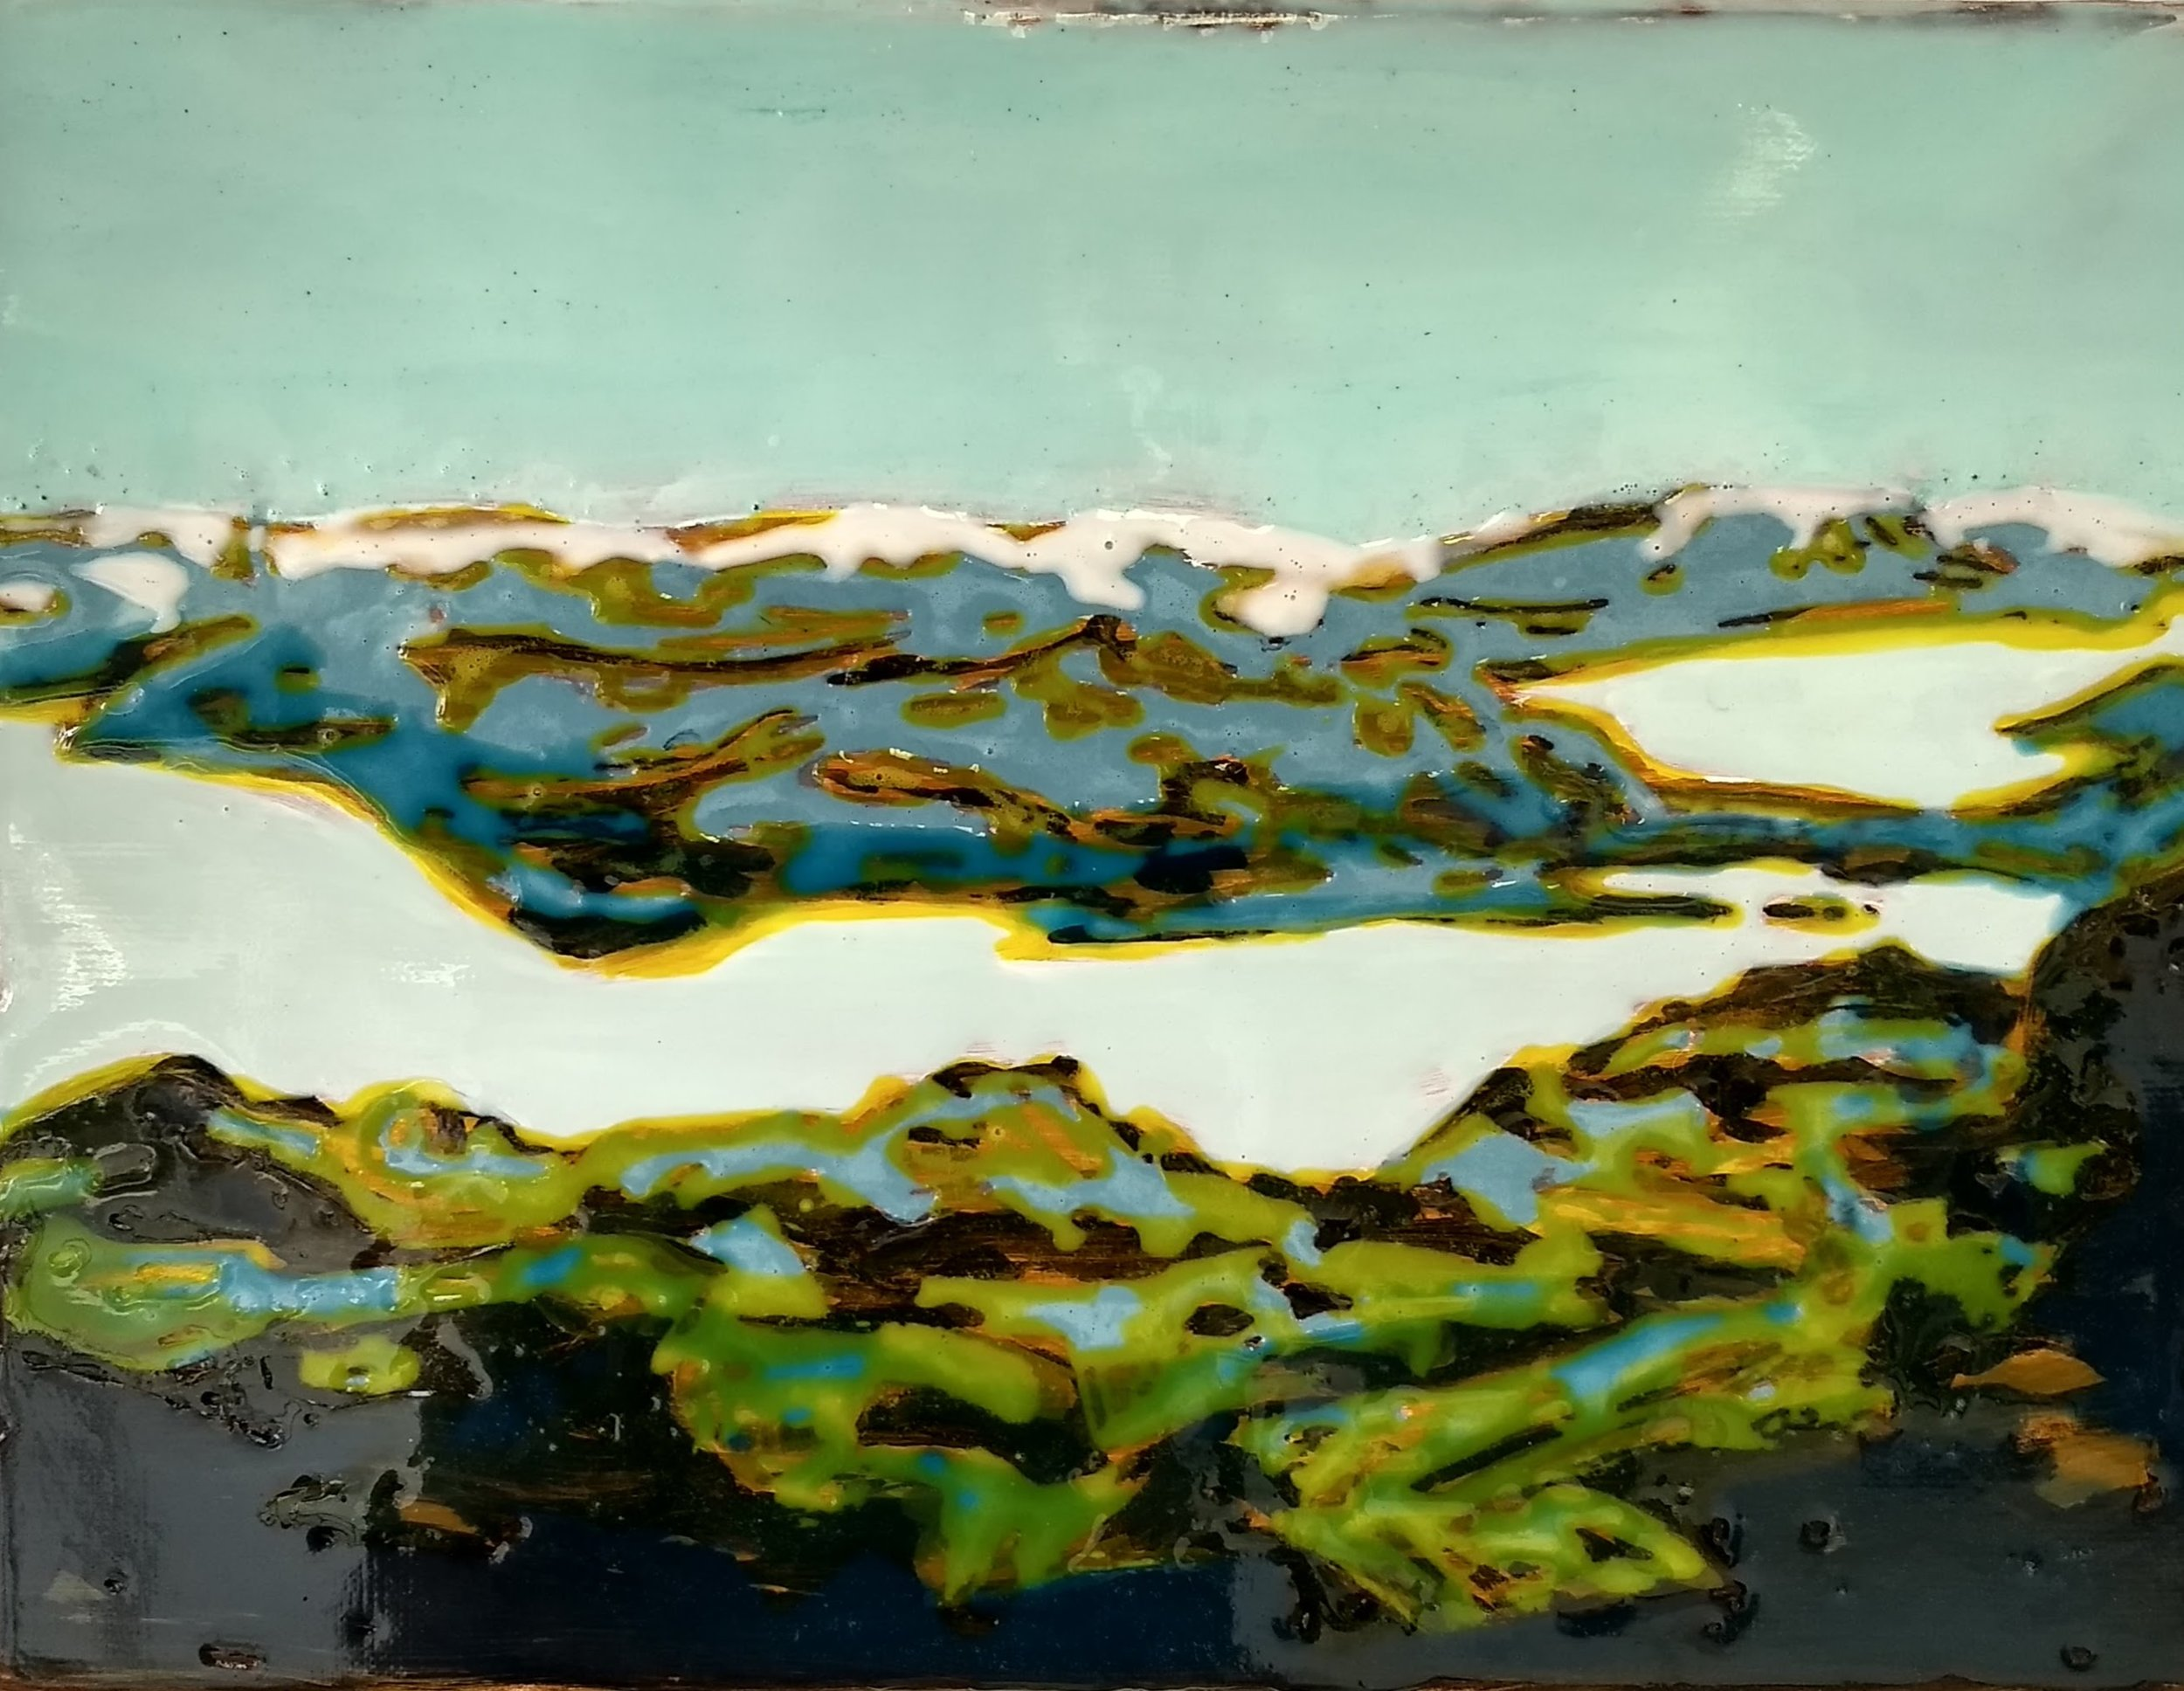 SOGNEFJELLVEGEN  30x40 cm Acrylic and epoxy on canvas